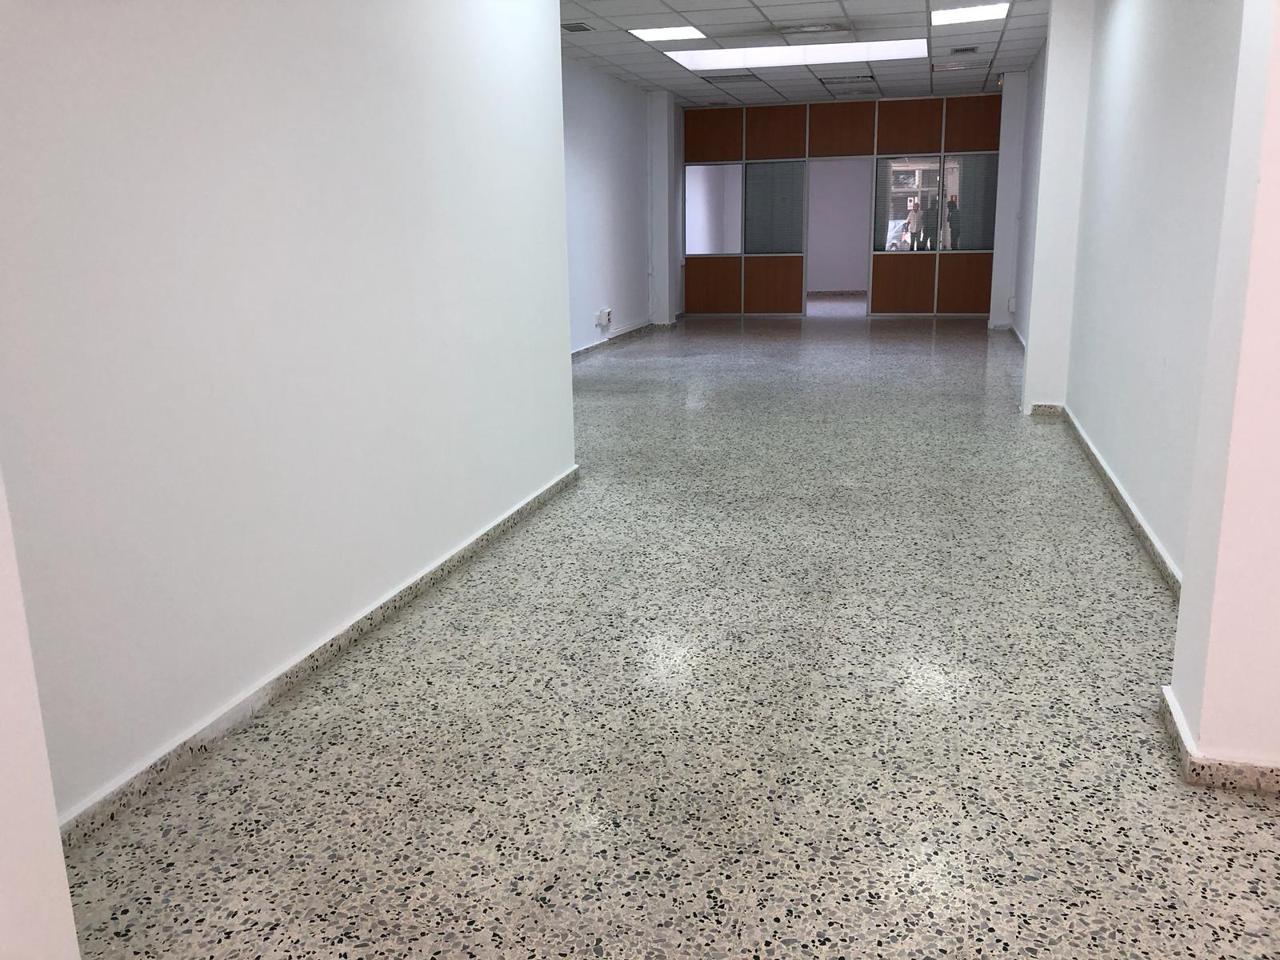 Lloguer Local Comercial  Mataró > centre. Local de 110m2 a pie de calle con persianas eléctricas y 2 venta